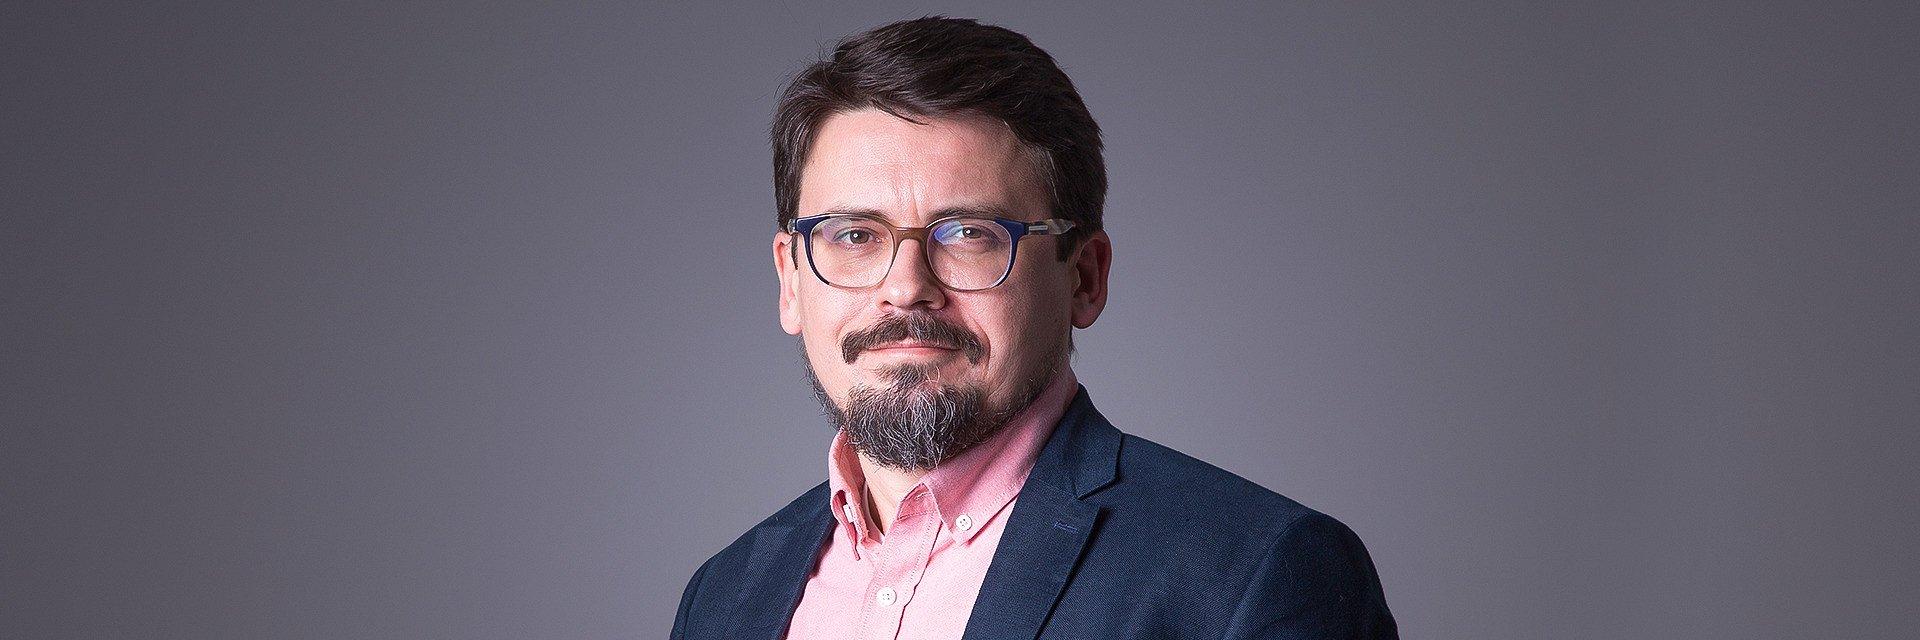 Norbert Franke objął funkcję Chief Technology Officera w Isobar Polska